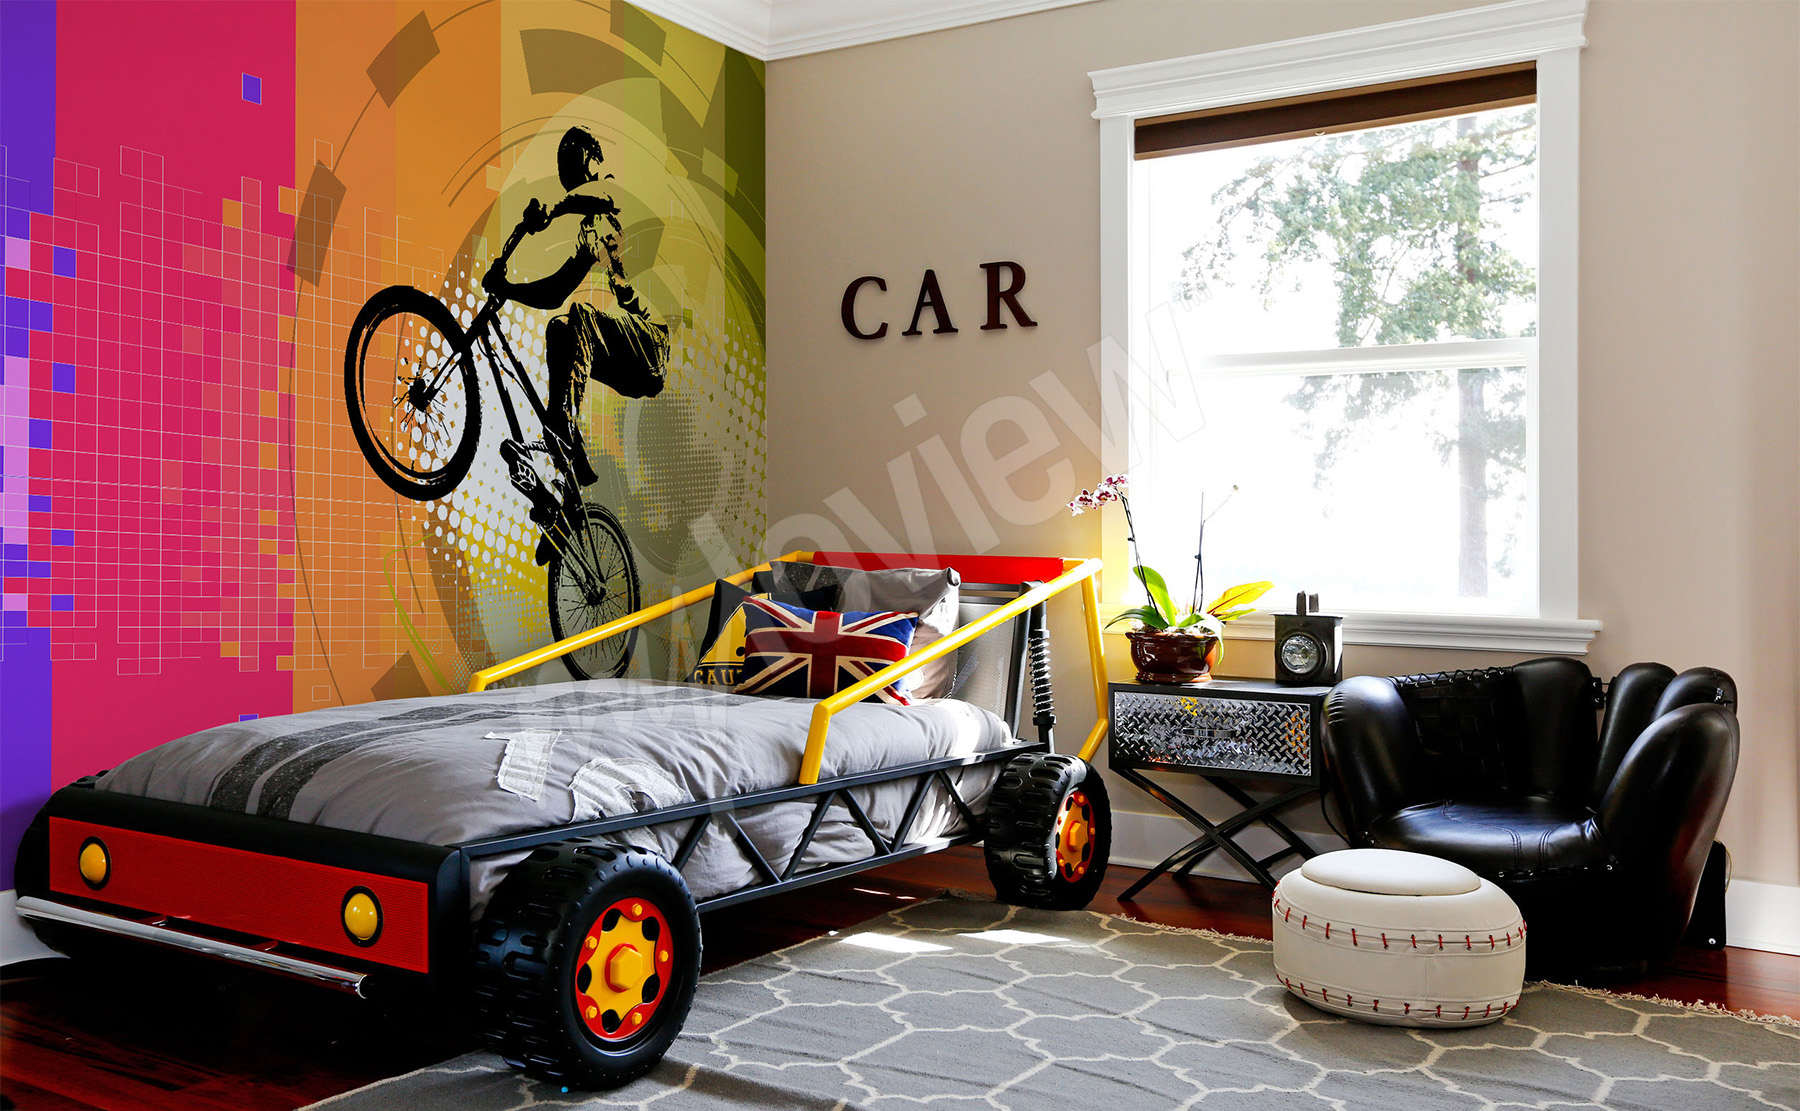 fototapety wg kategorii sport fototapeta. Black Bedroom Furniture Sets. Home Design Ideas